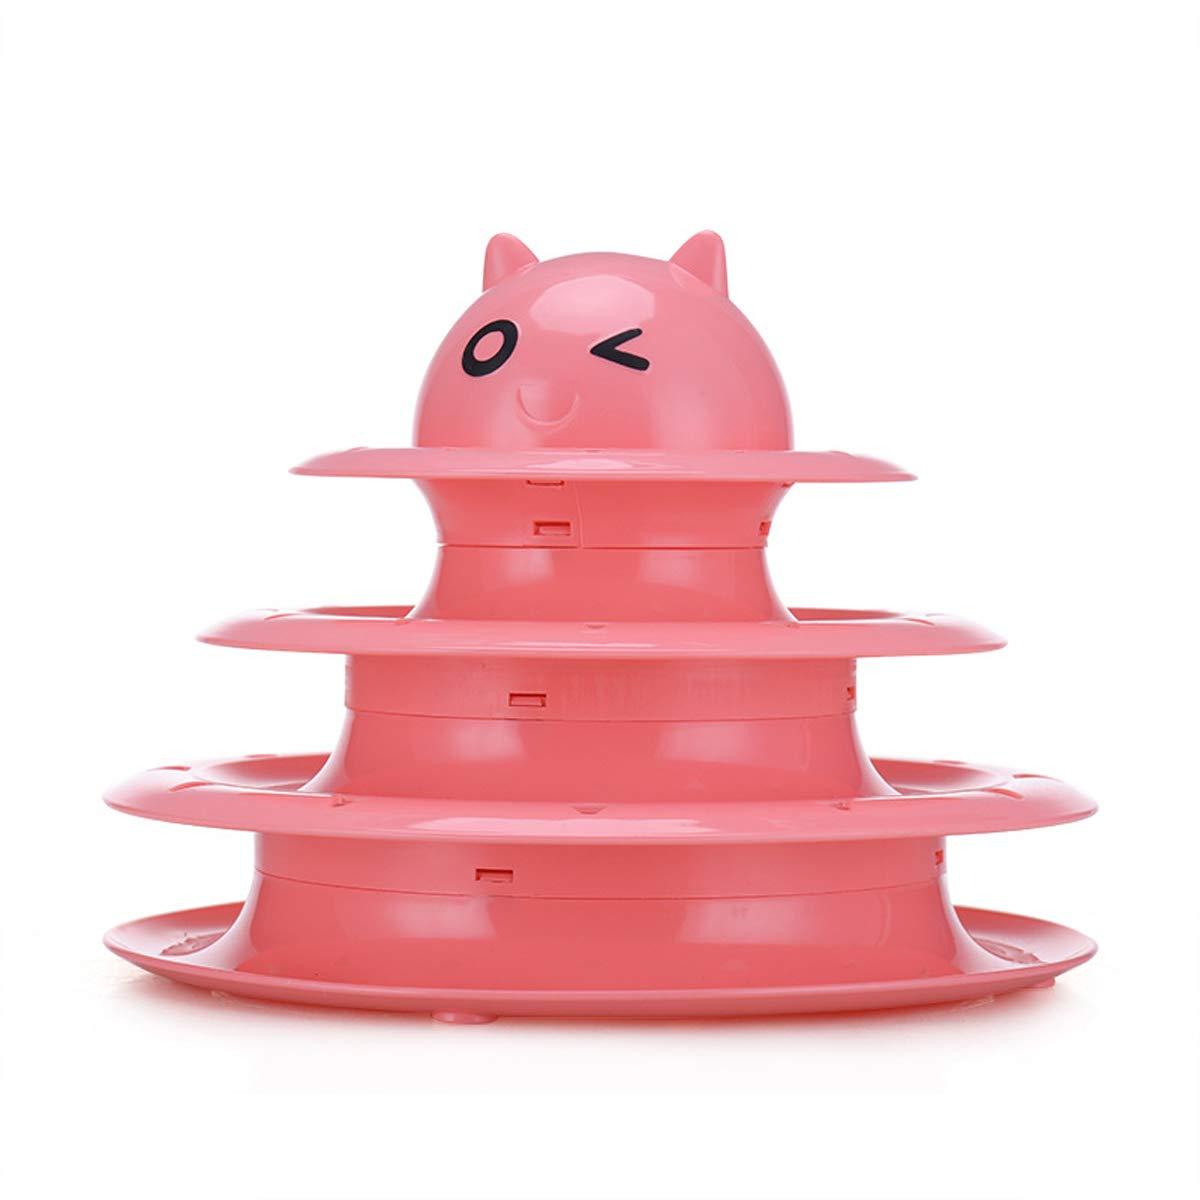 Bluexury ペット猫ボールおもちゃ インタラクティブファン 3段タワーボール&トラック 猫のティーザーおもちゃ 猫のおもちゃ B07HRNSRFD ピンク ピンク